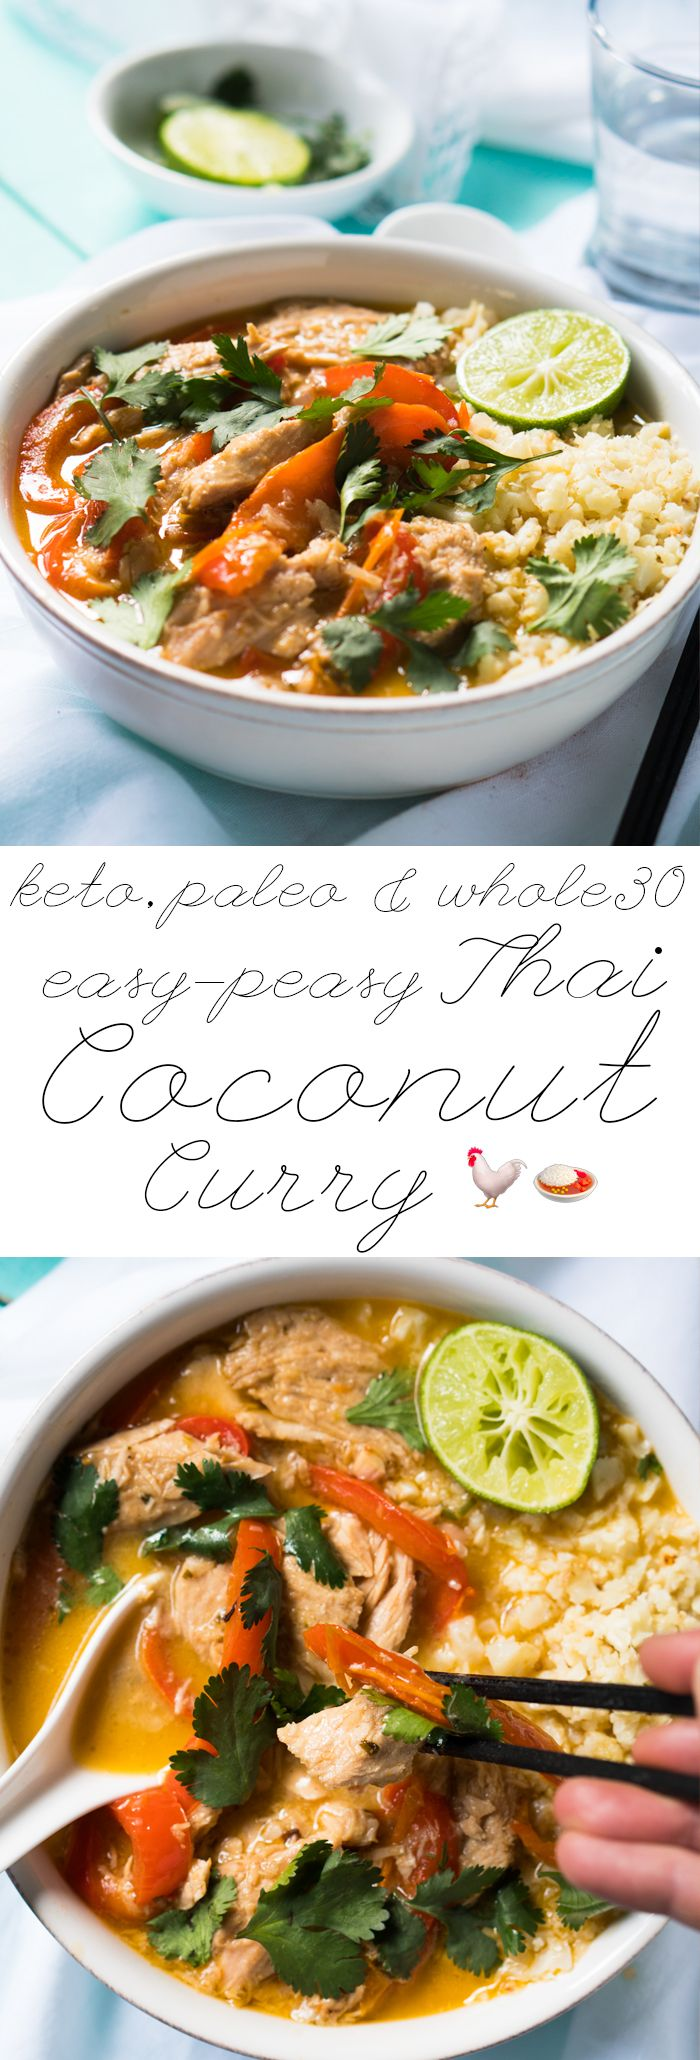 Whole30, Paleo & Keto Thai Coconut Curry Chicken  The Easy-Peasy Version! #ketocurry #ketothai